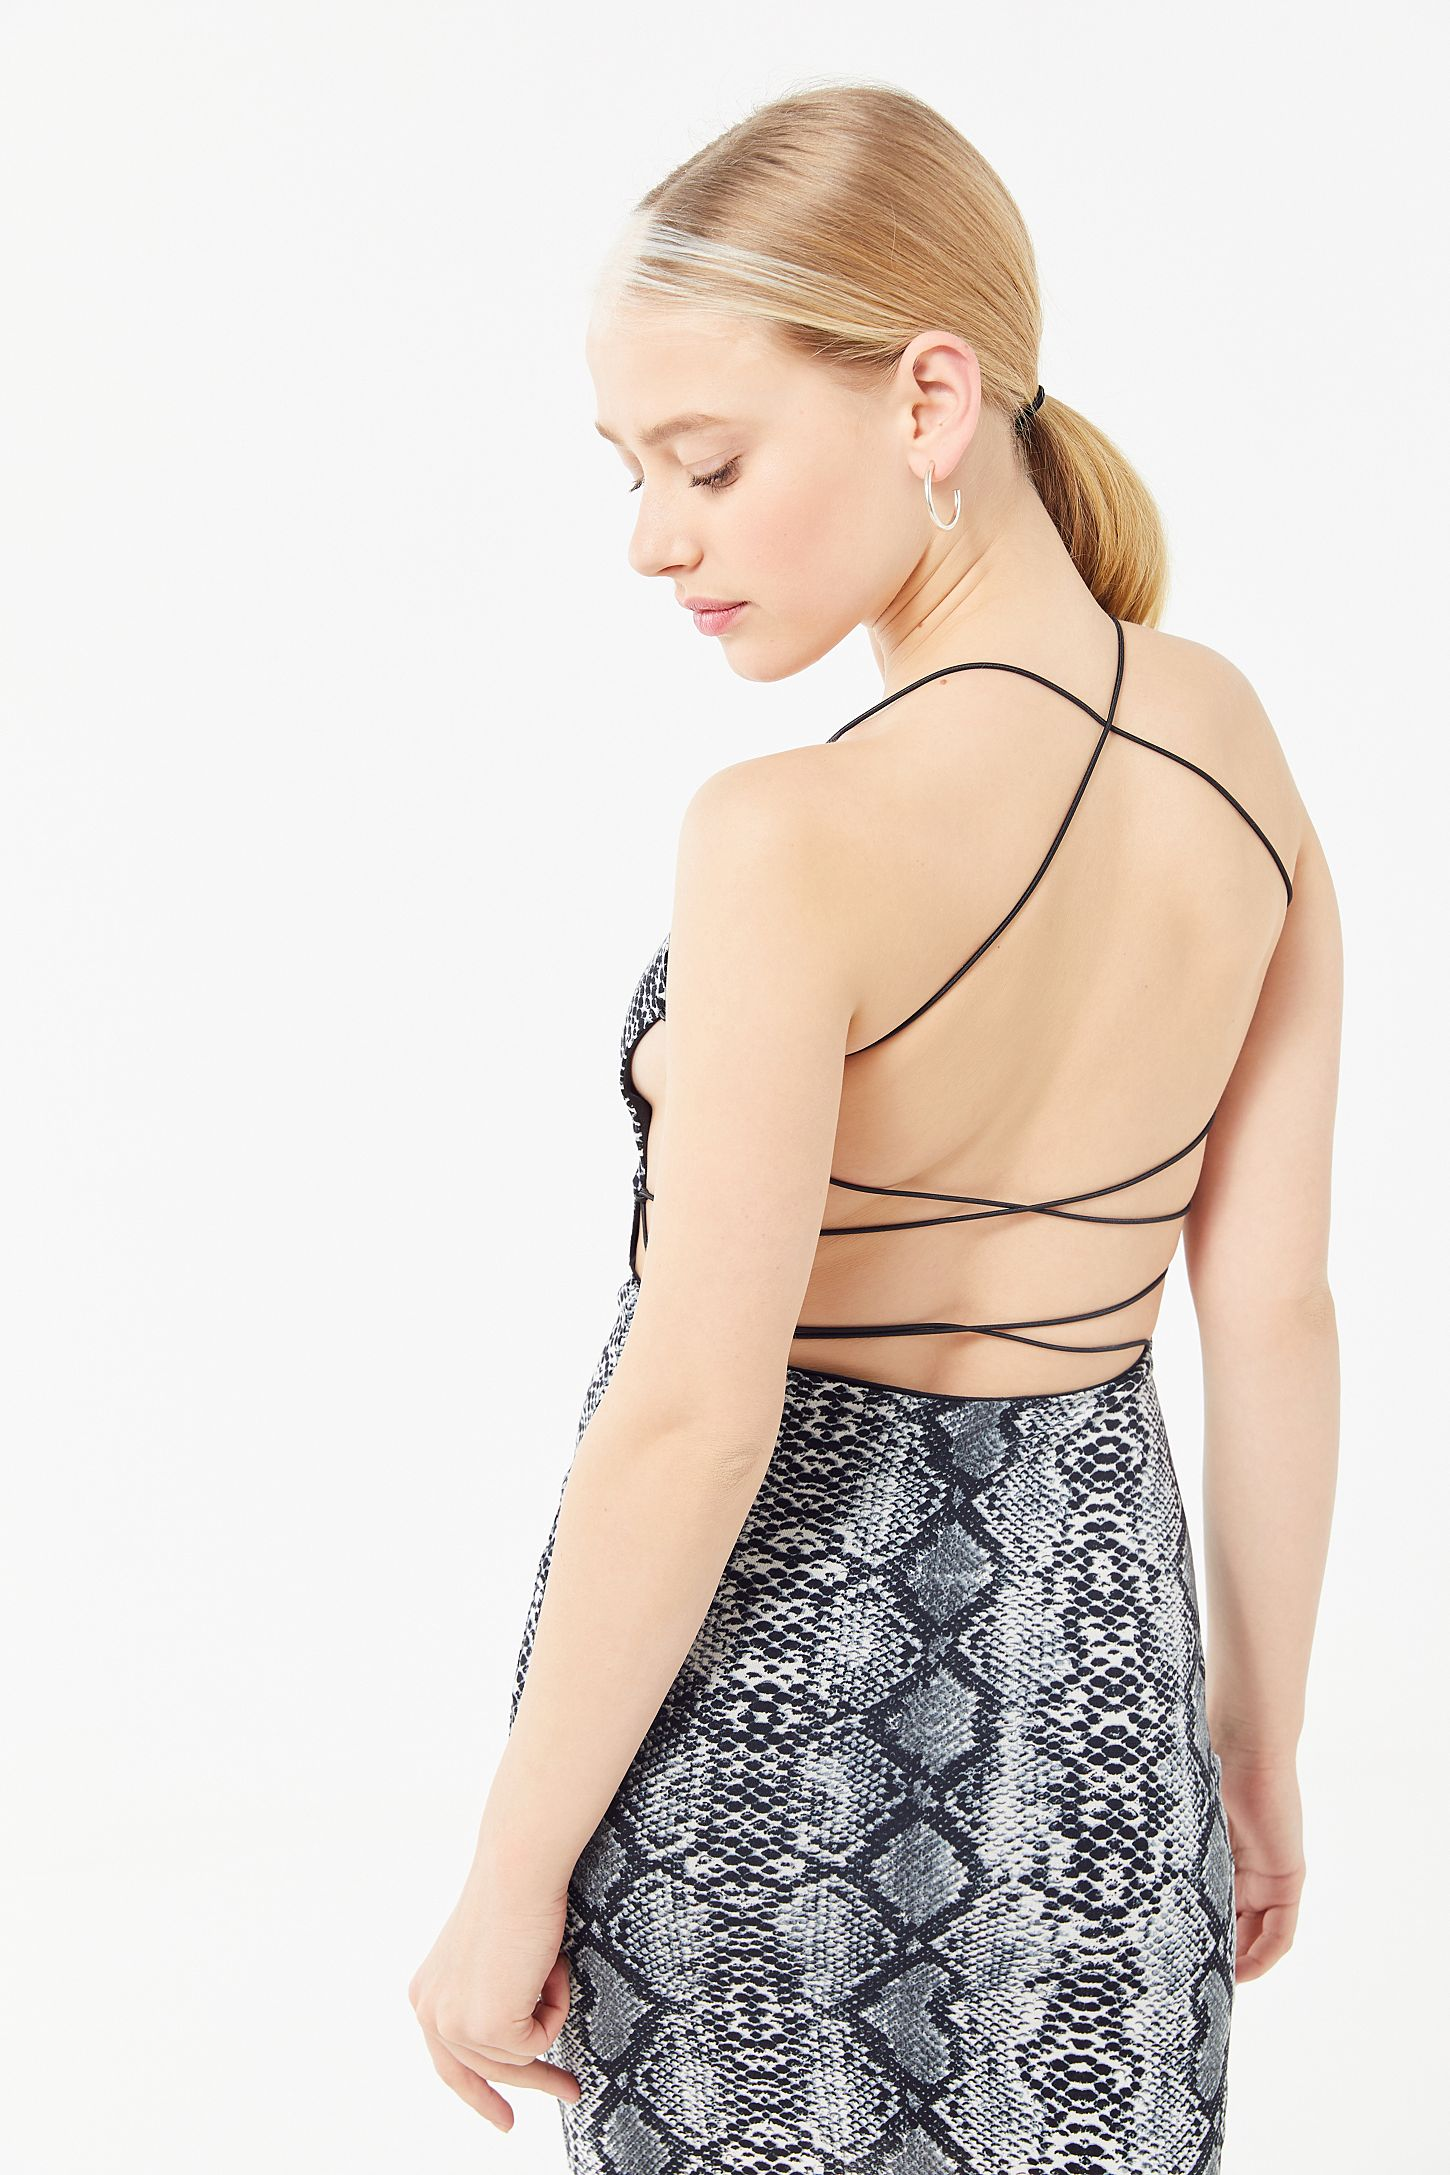 save off half off best prices Tiger Mist Tyra Snake Print Strappy Back Mini Dress